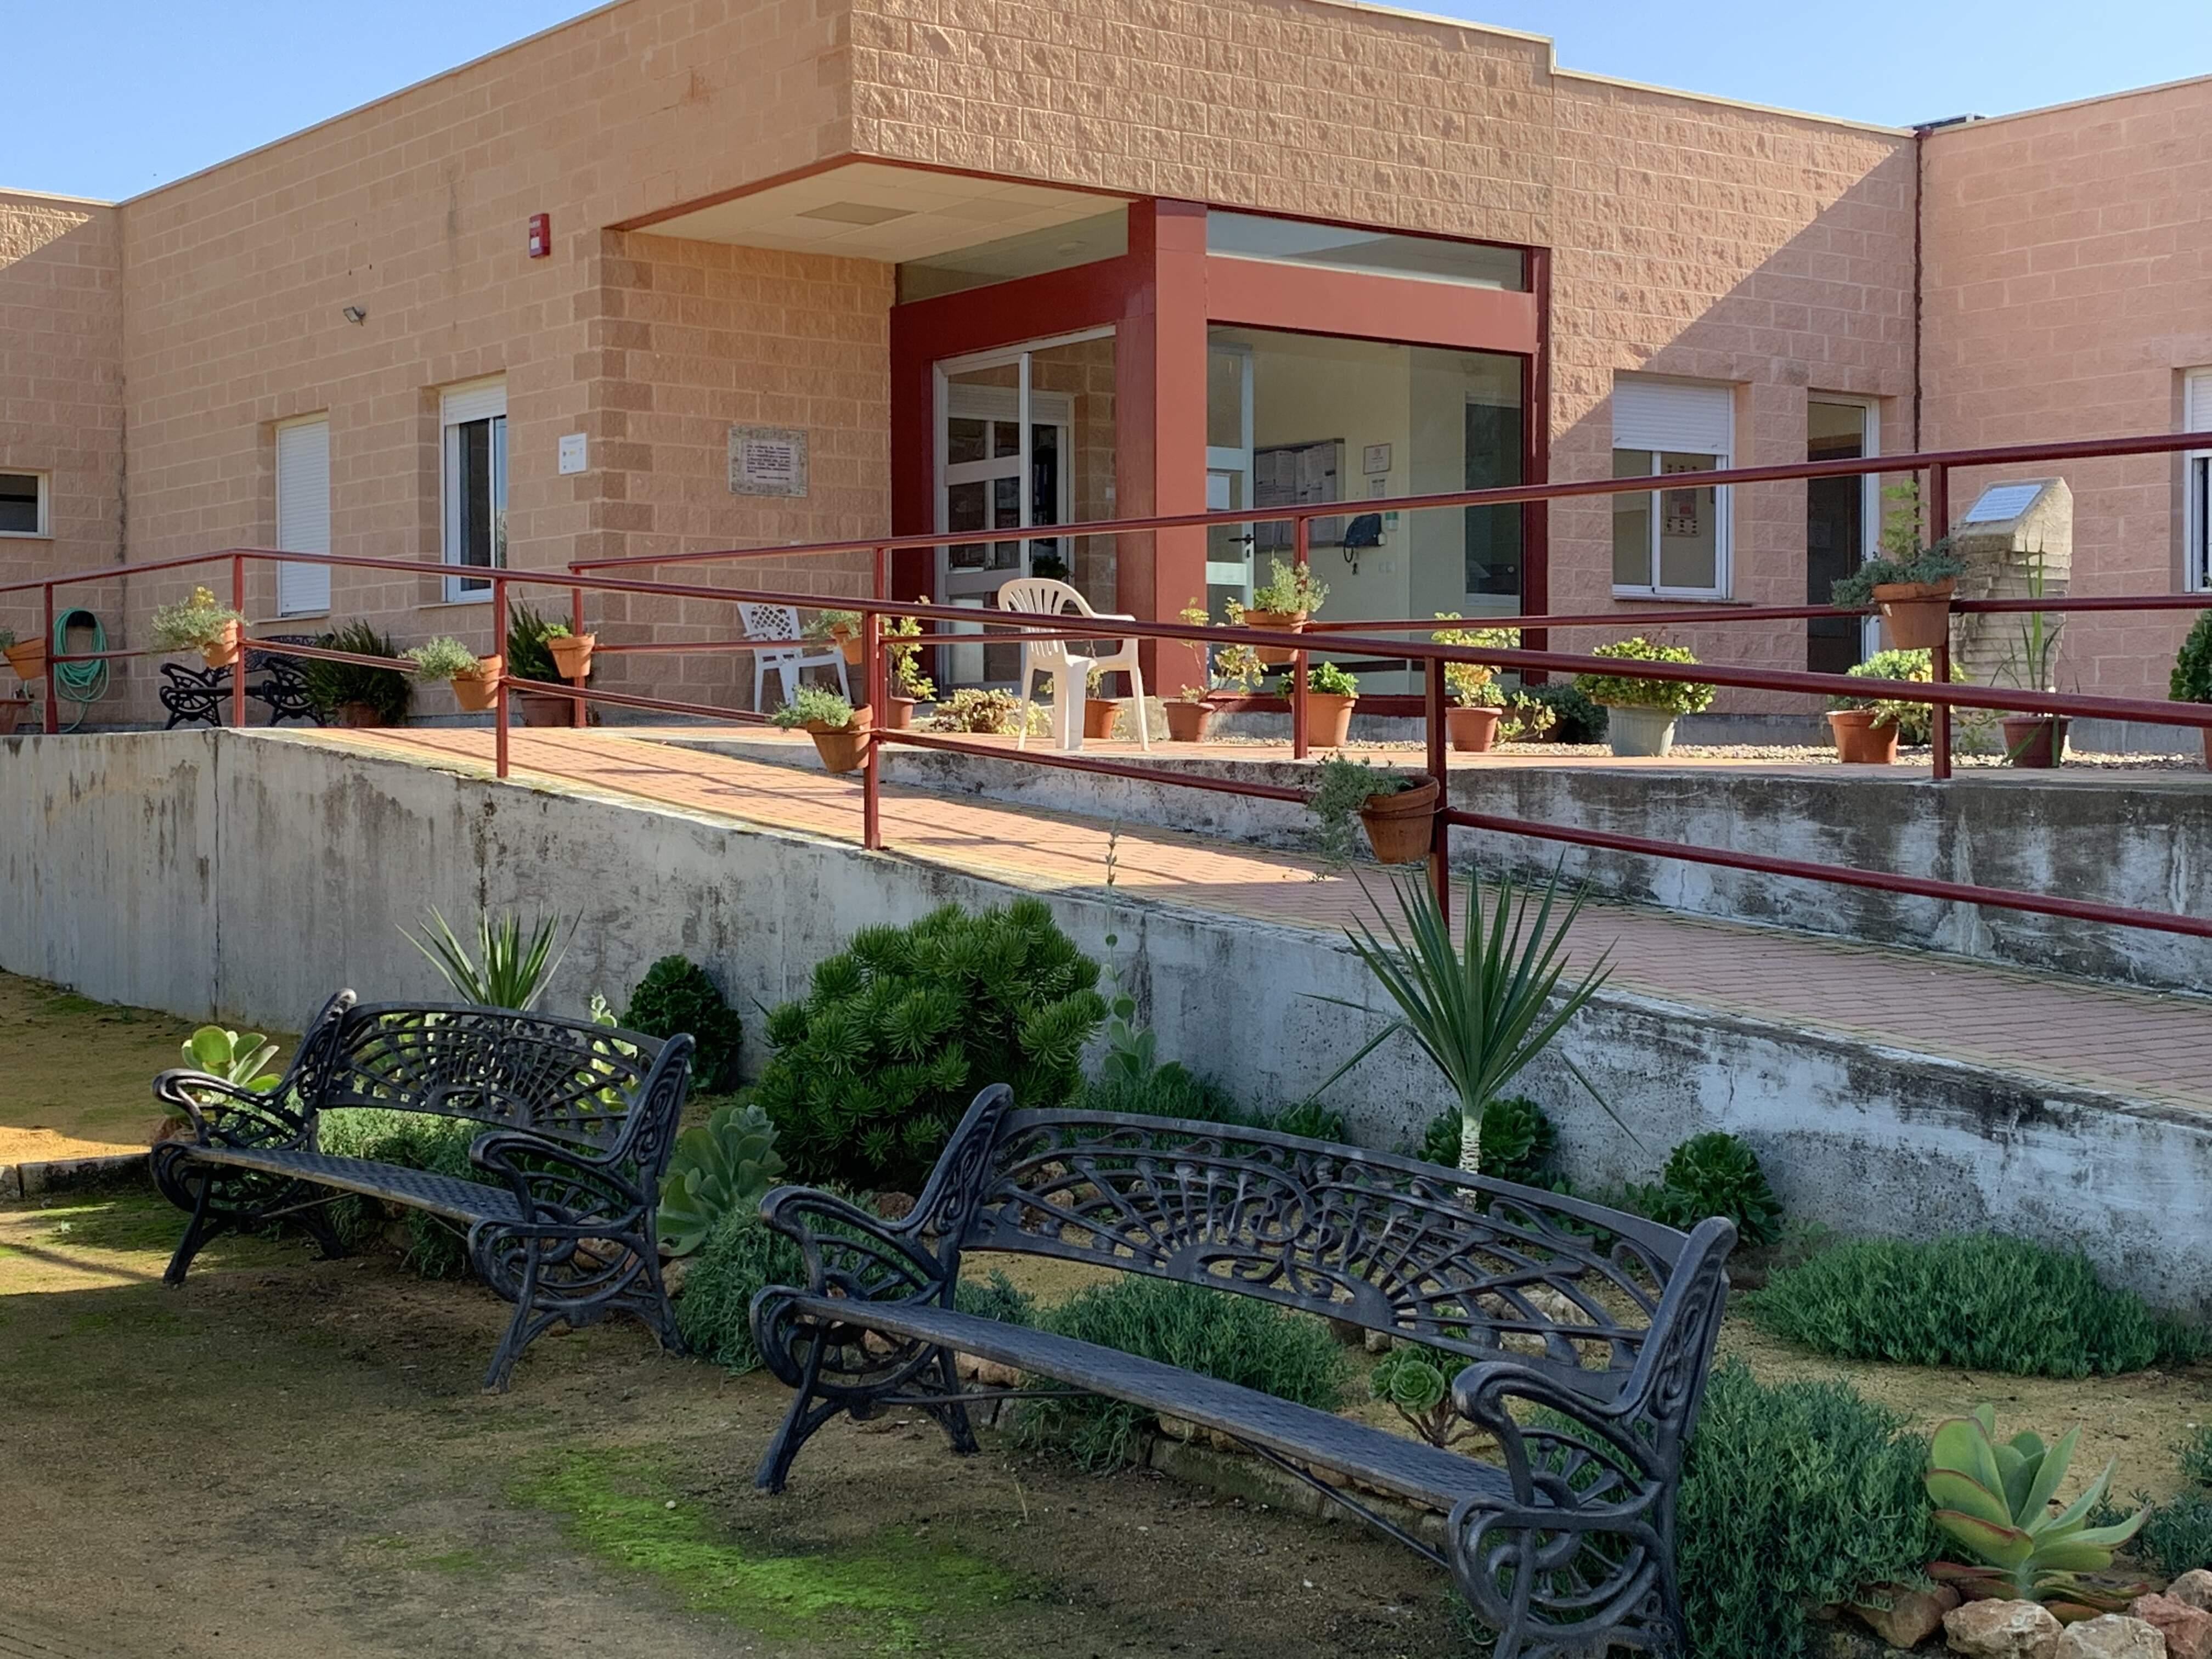 Centro_Residencial_de_Mayores_Cruz_Blanca_-_fachada